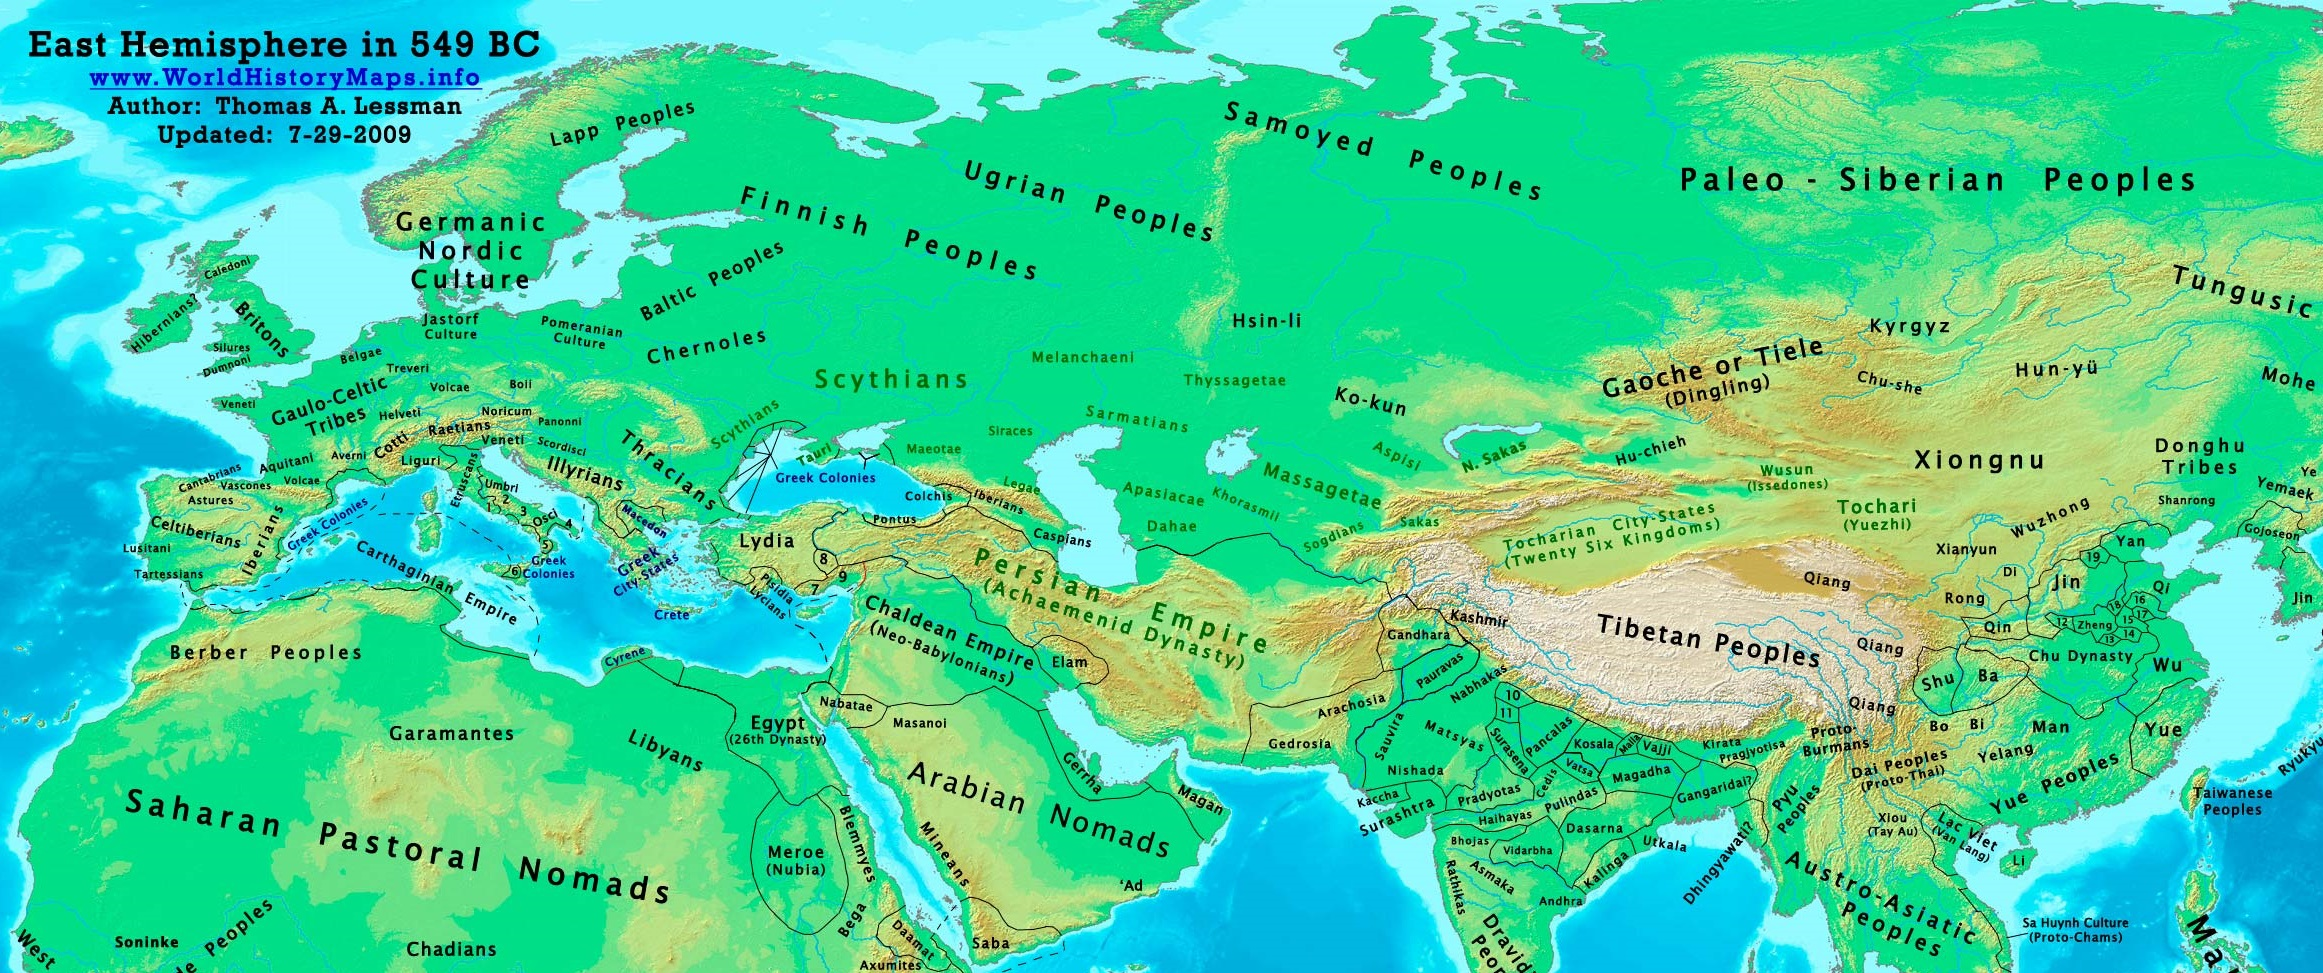 549 BC